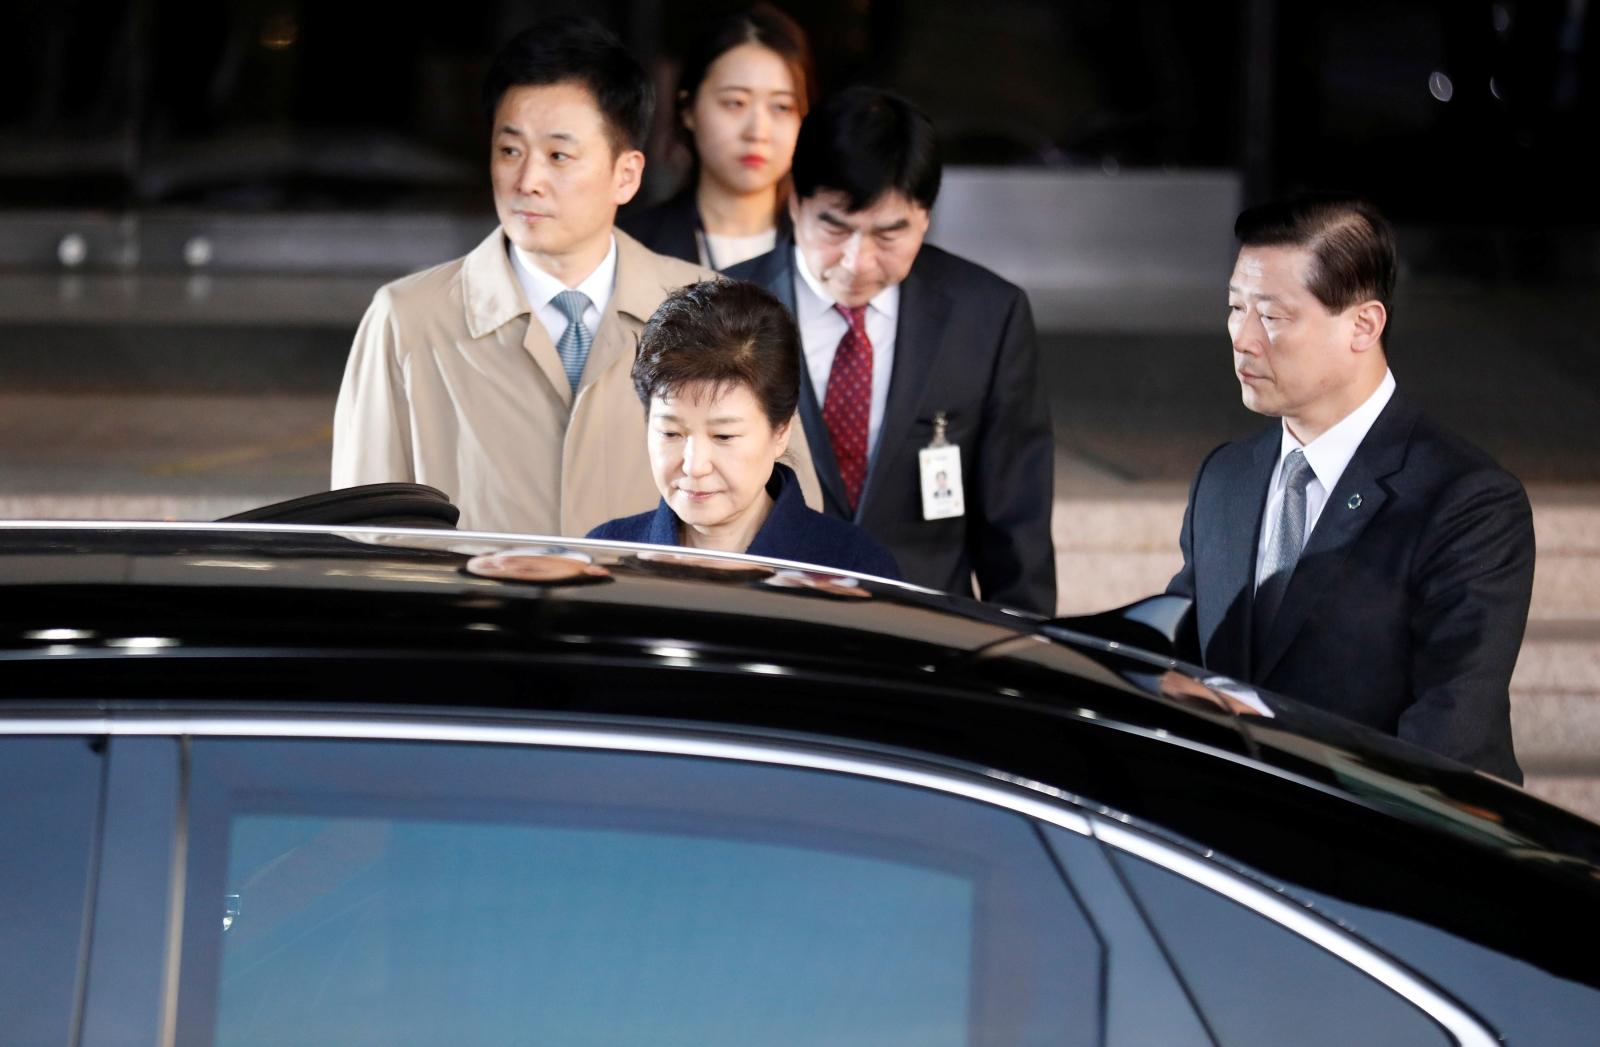 South Korea's ousted leader Park Geun-hye